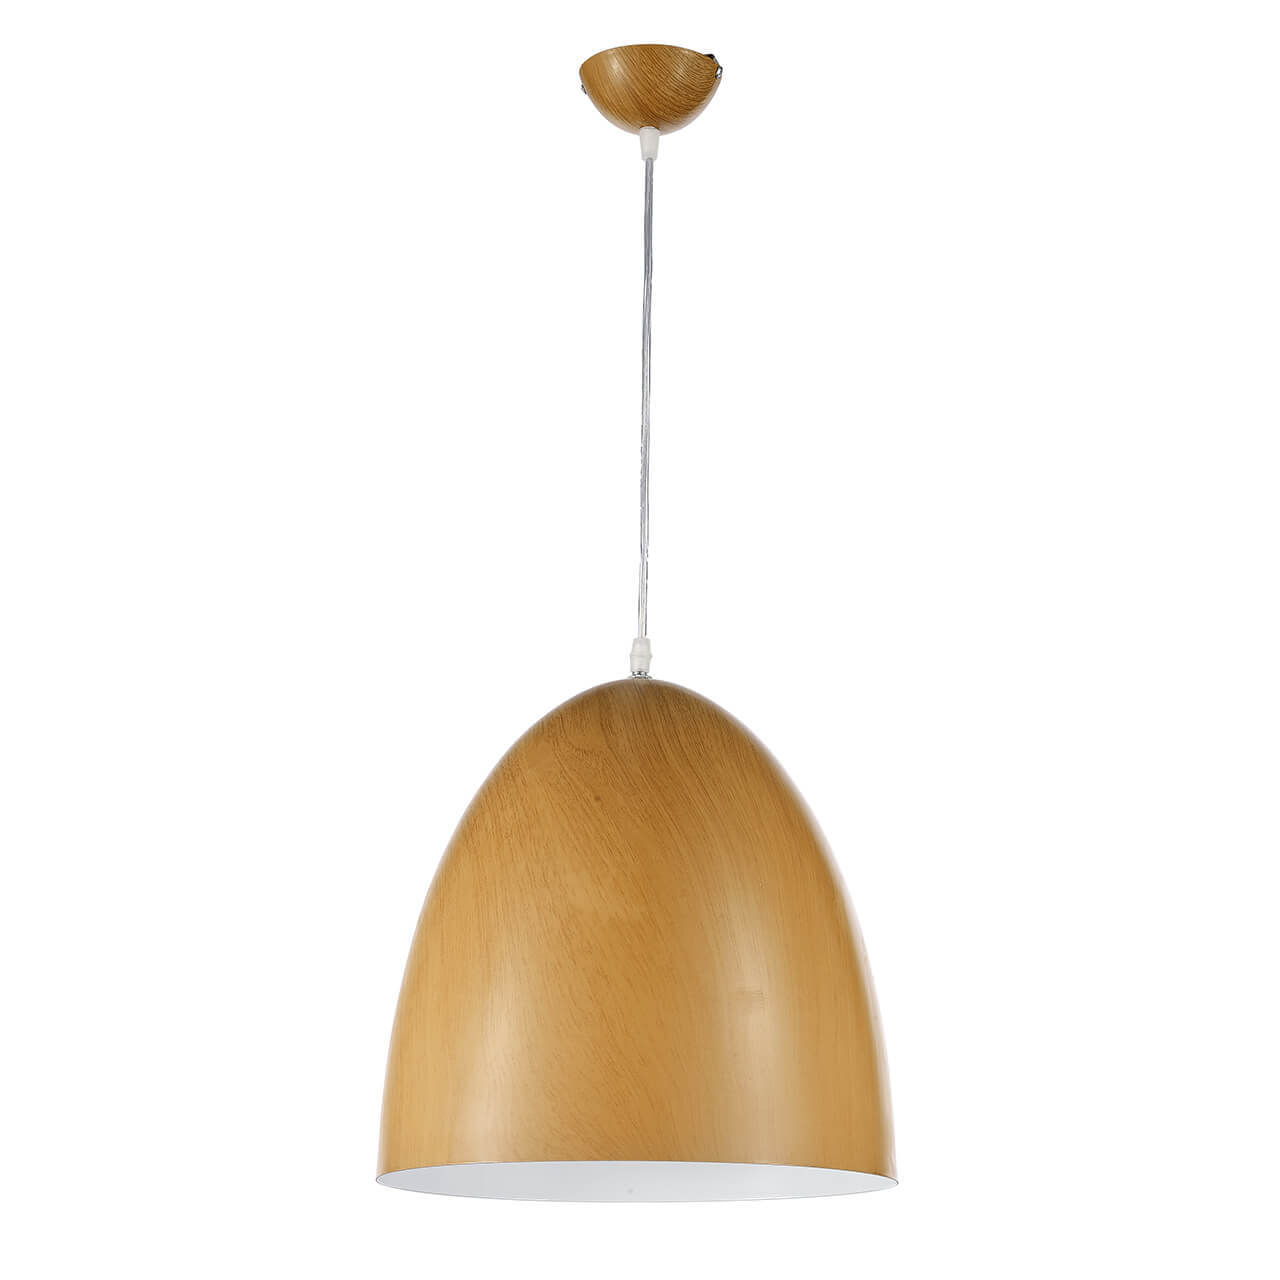 Светильник Arti Lampadari Bruno E 1.3.P1 BR Bruno цена 2017